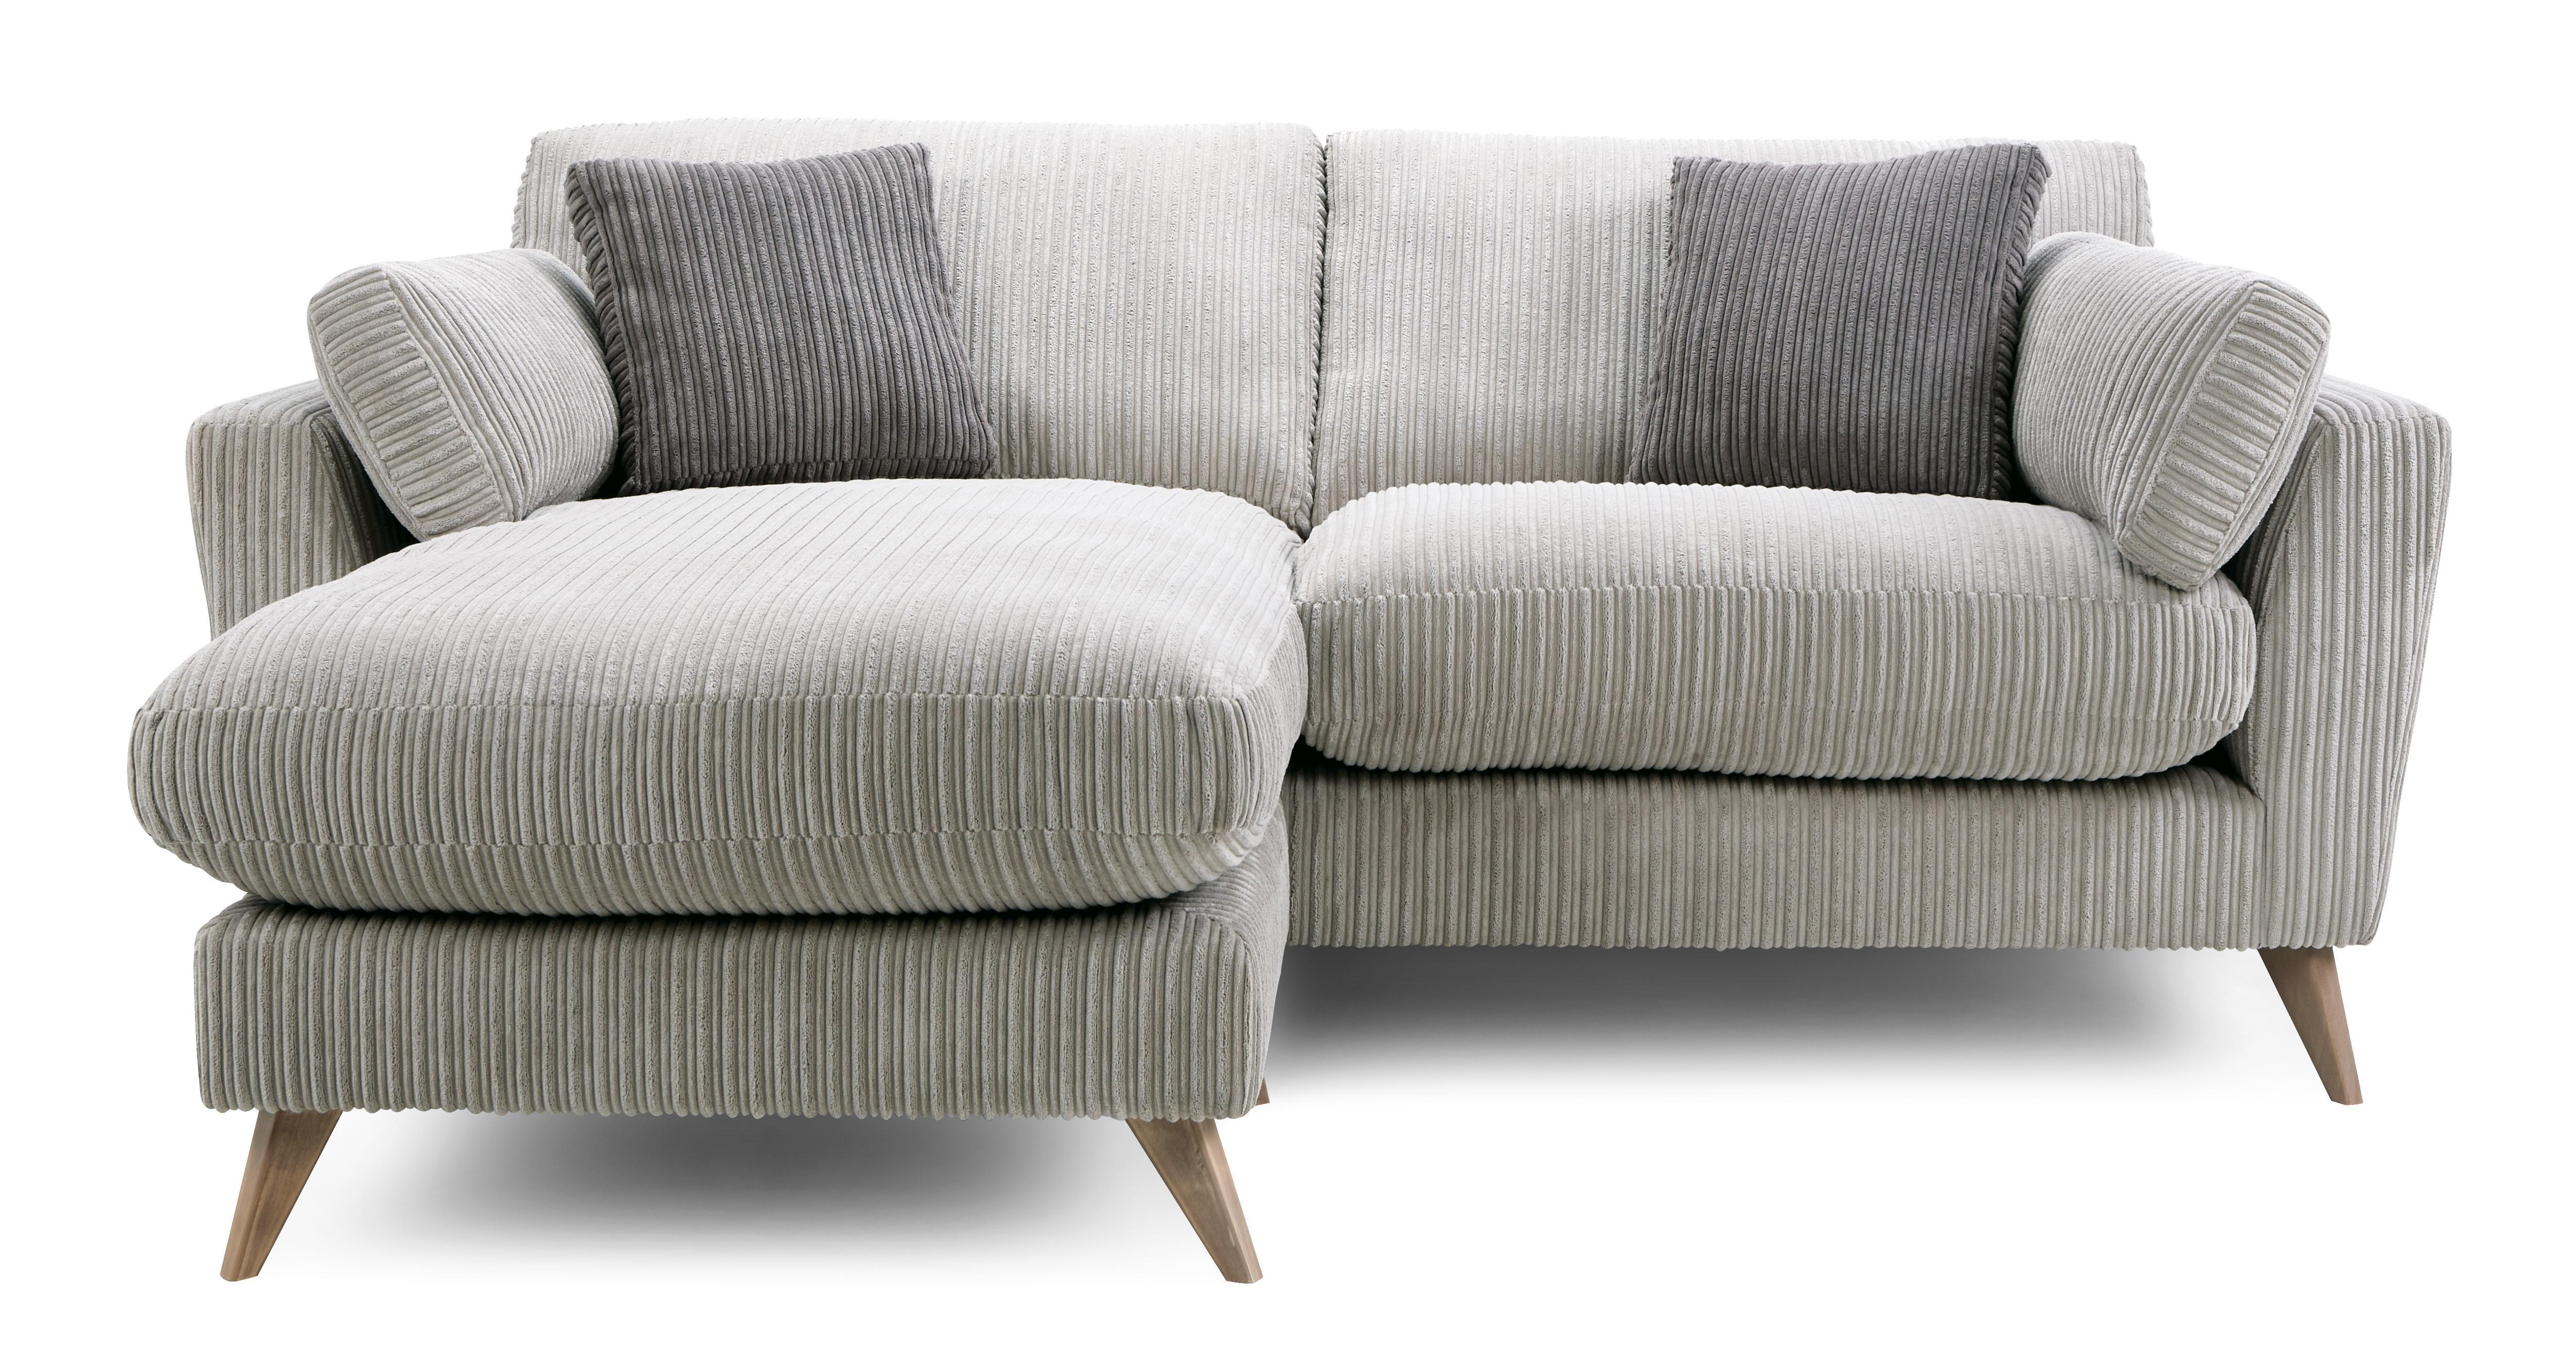 Benji 4 Seater Lounger Marley Sofa Styling Lounger Dfs Sofa